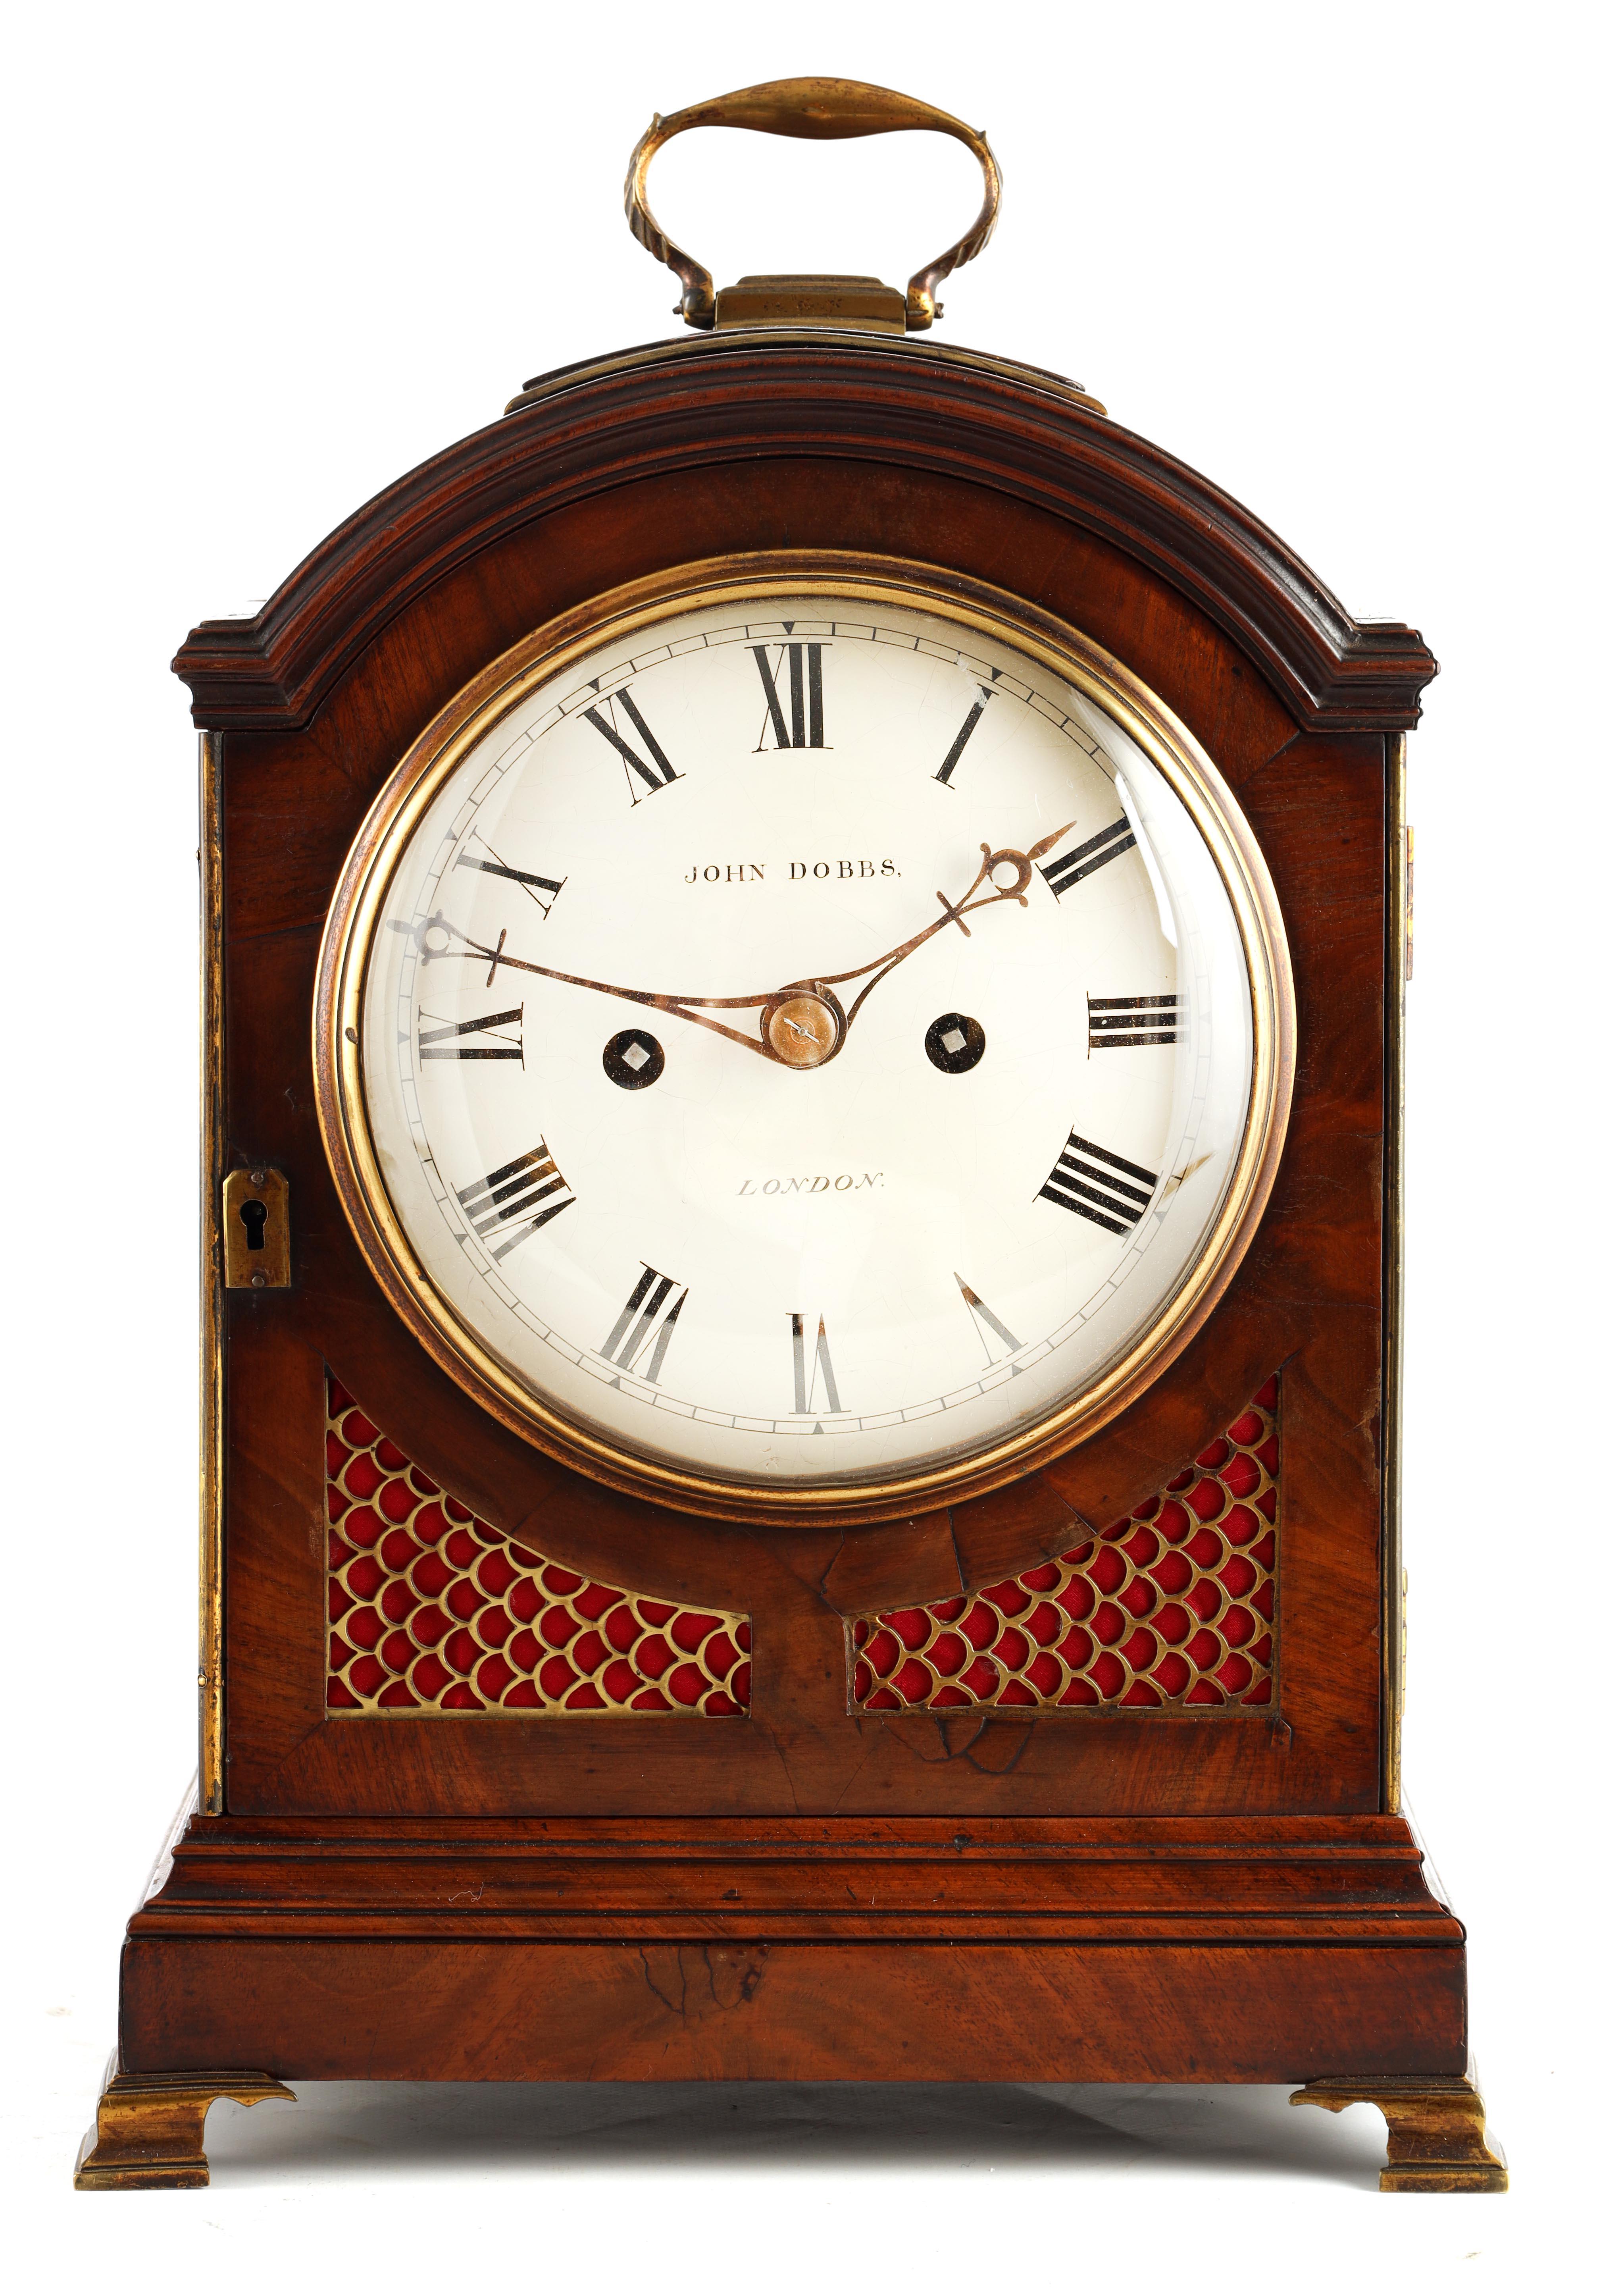 JOHN DOBBS, LONDON A LATE GEORGE III MAHOGANY VERGE BRACKET CLOCK the figured mahogany case with